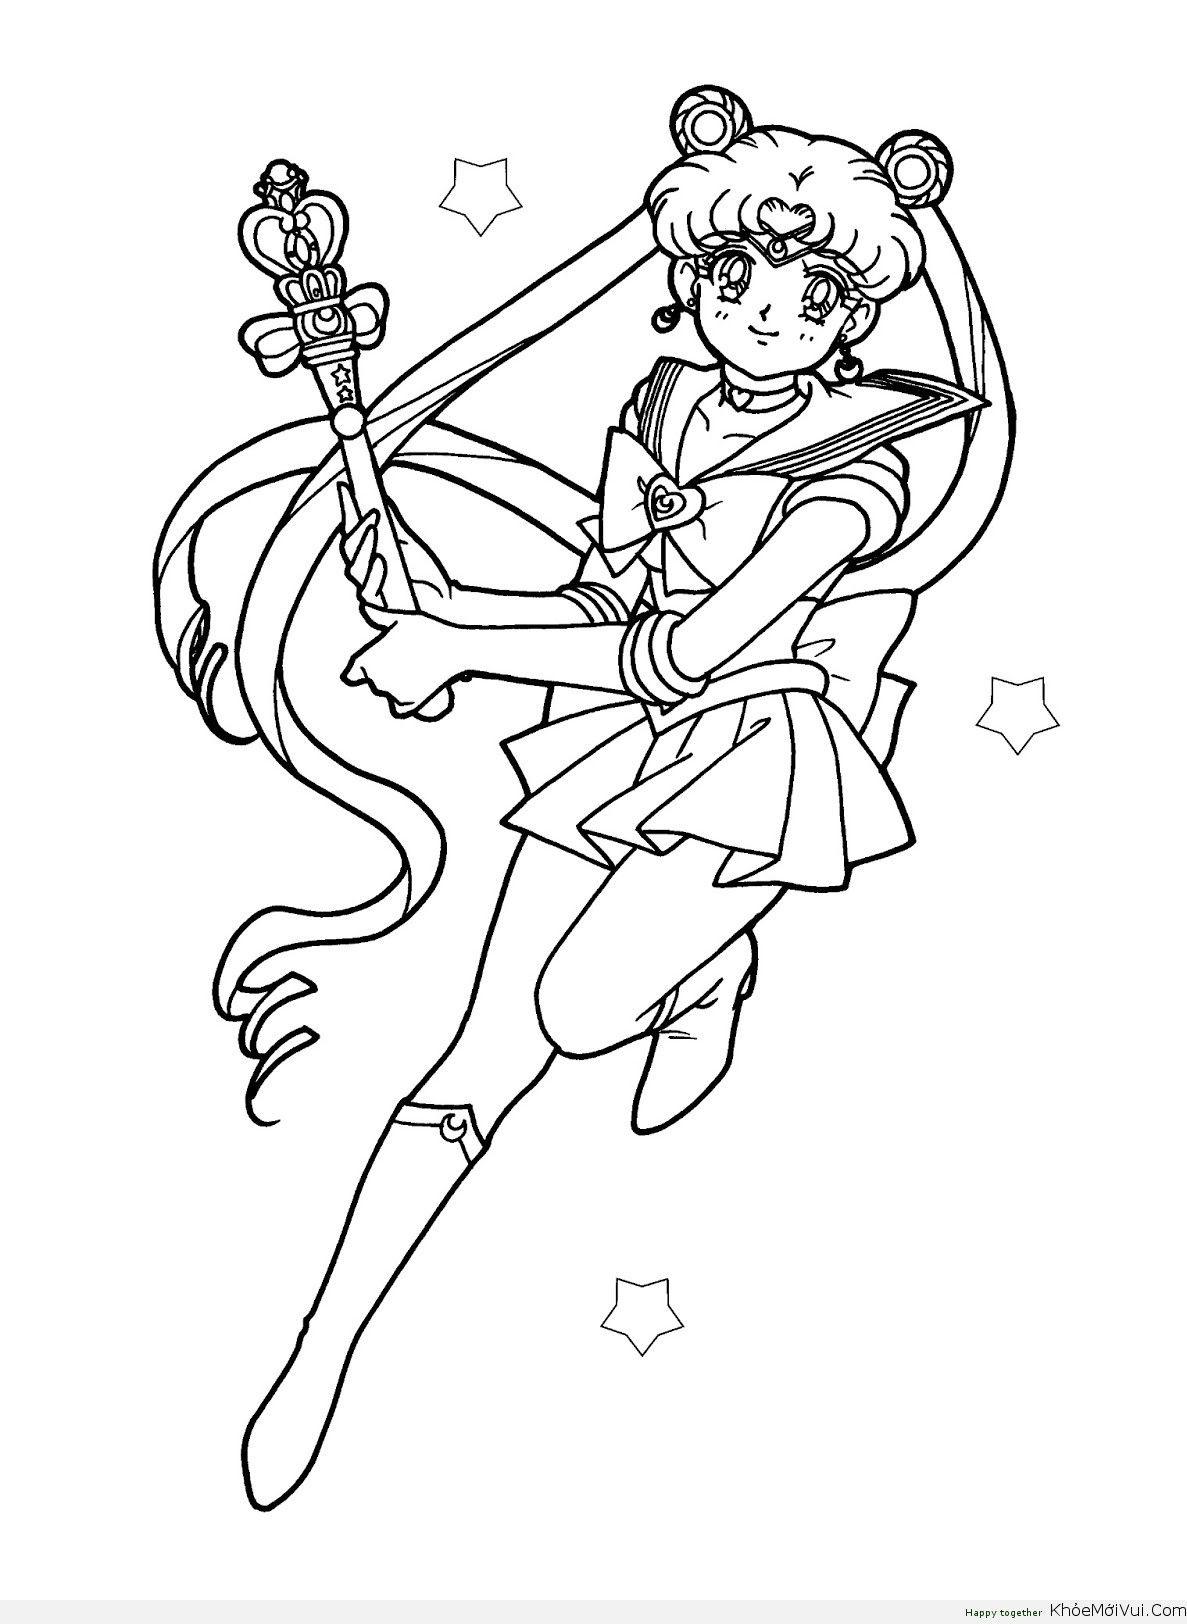 Pin de Uyên Vũ en anime | Pinterest